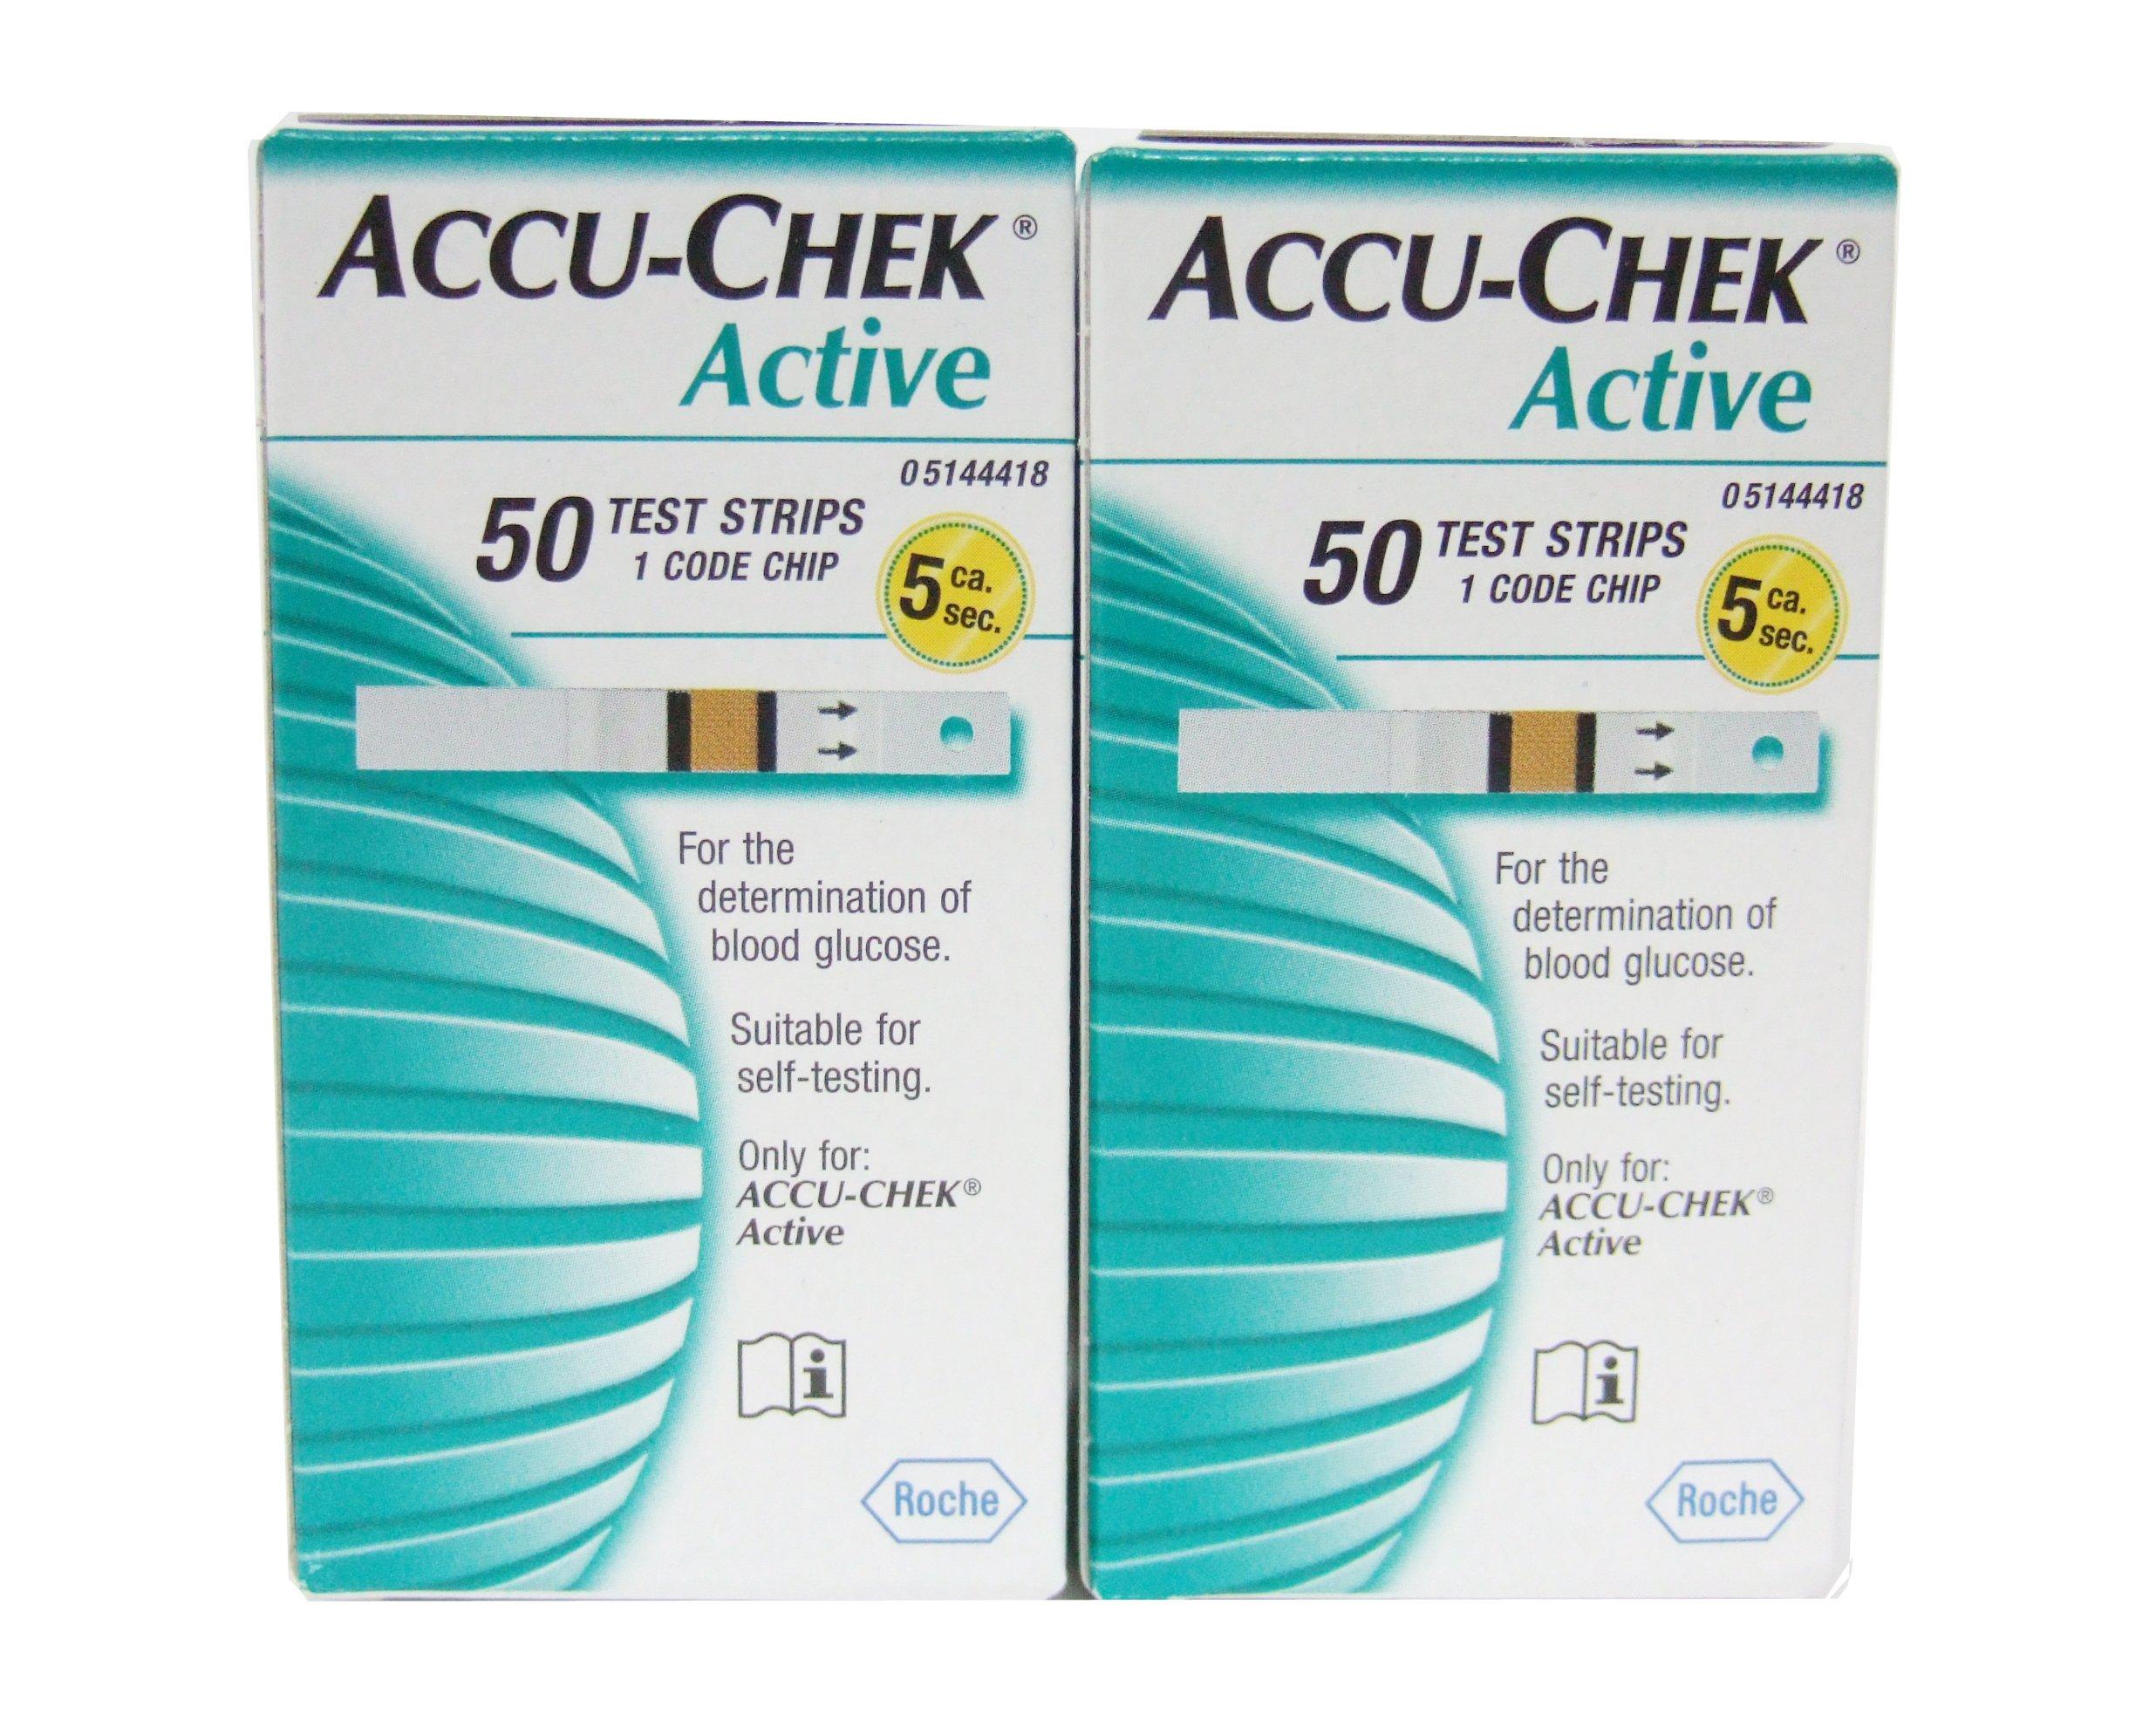 Roche ACCU-CHEK Active Diabetic Test Strips - Box of 50 (2box)